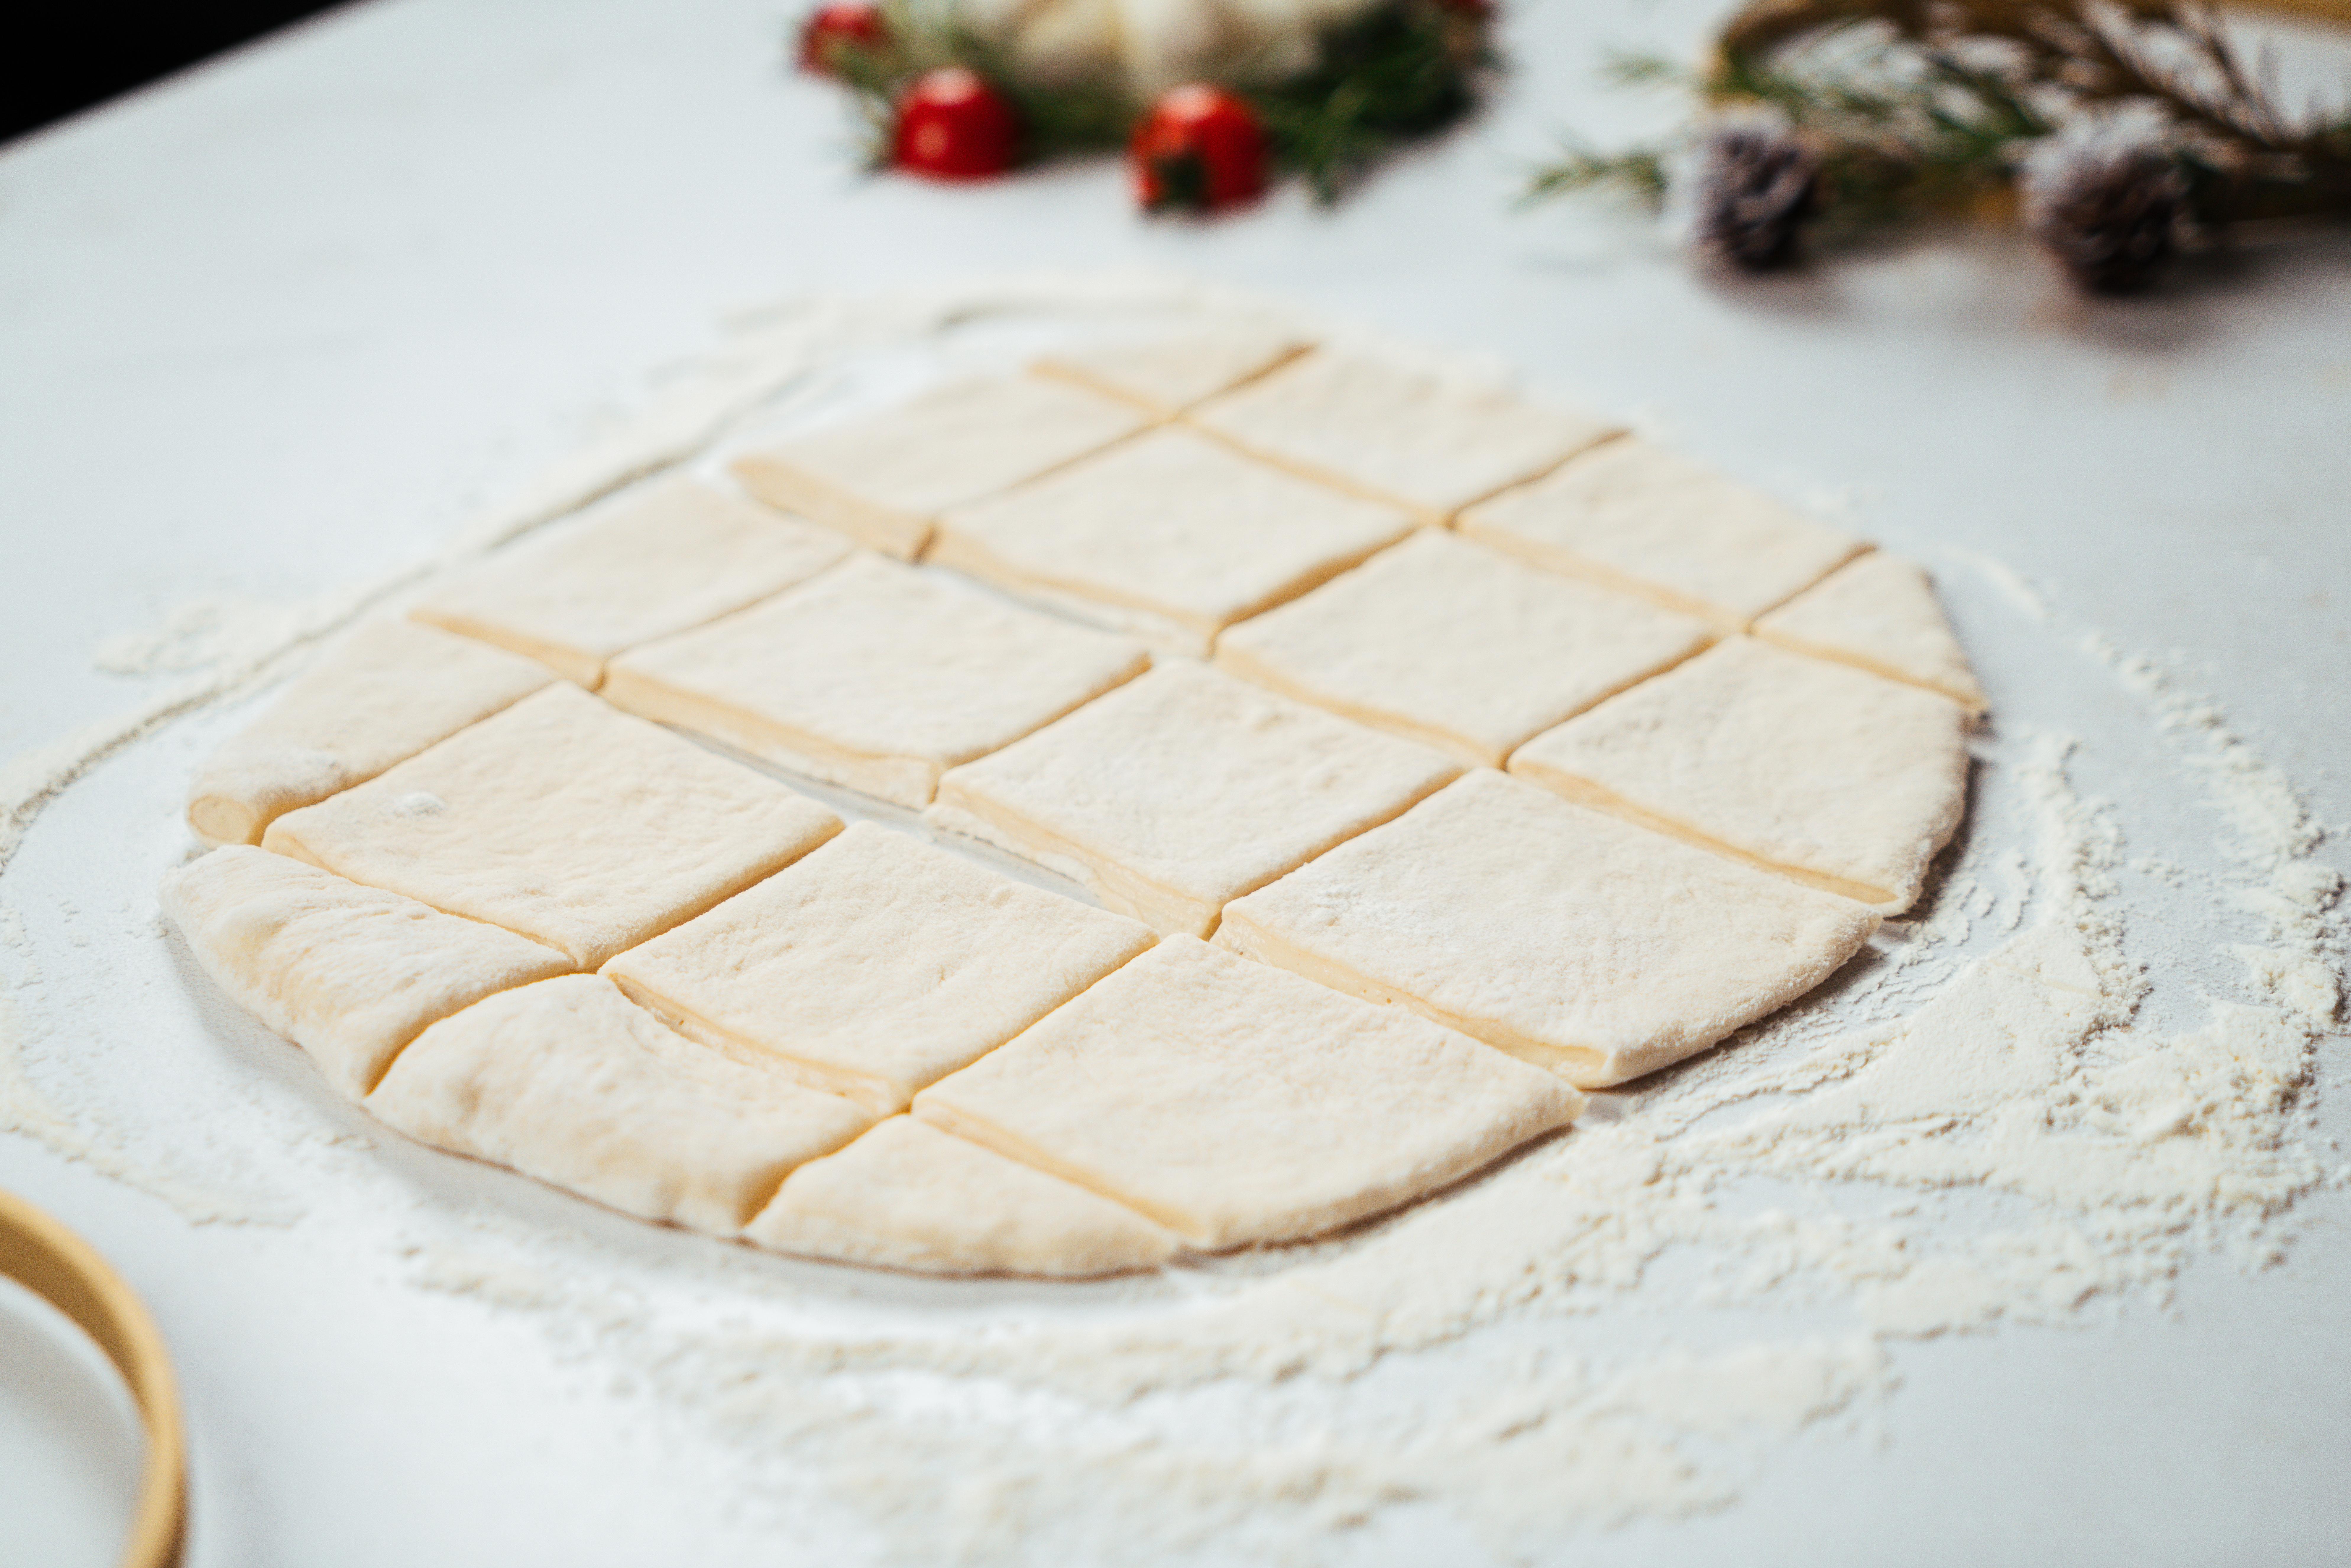 masa de hojaldre cortada en mini cuadros para hacer empandas, recetas de empanadas con hojaldre paso a paso